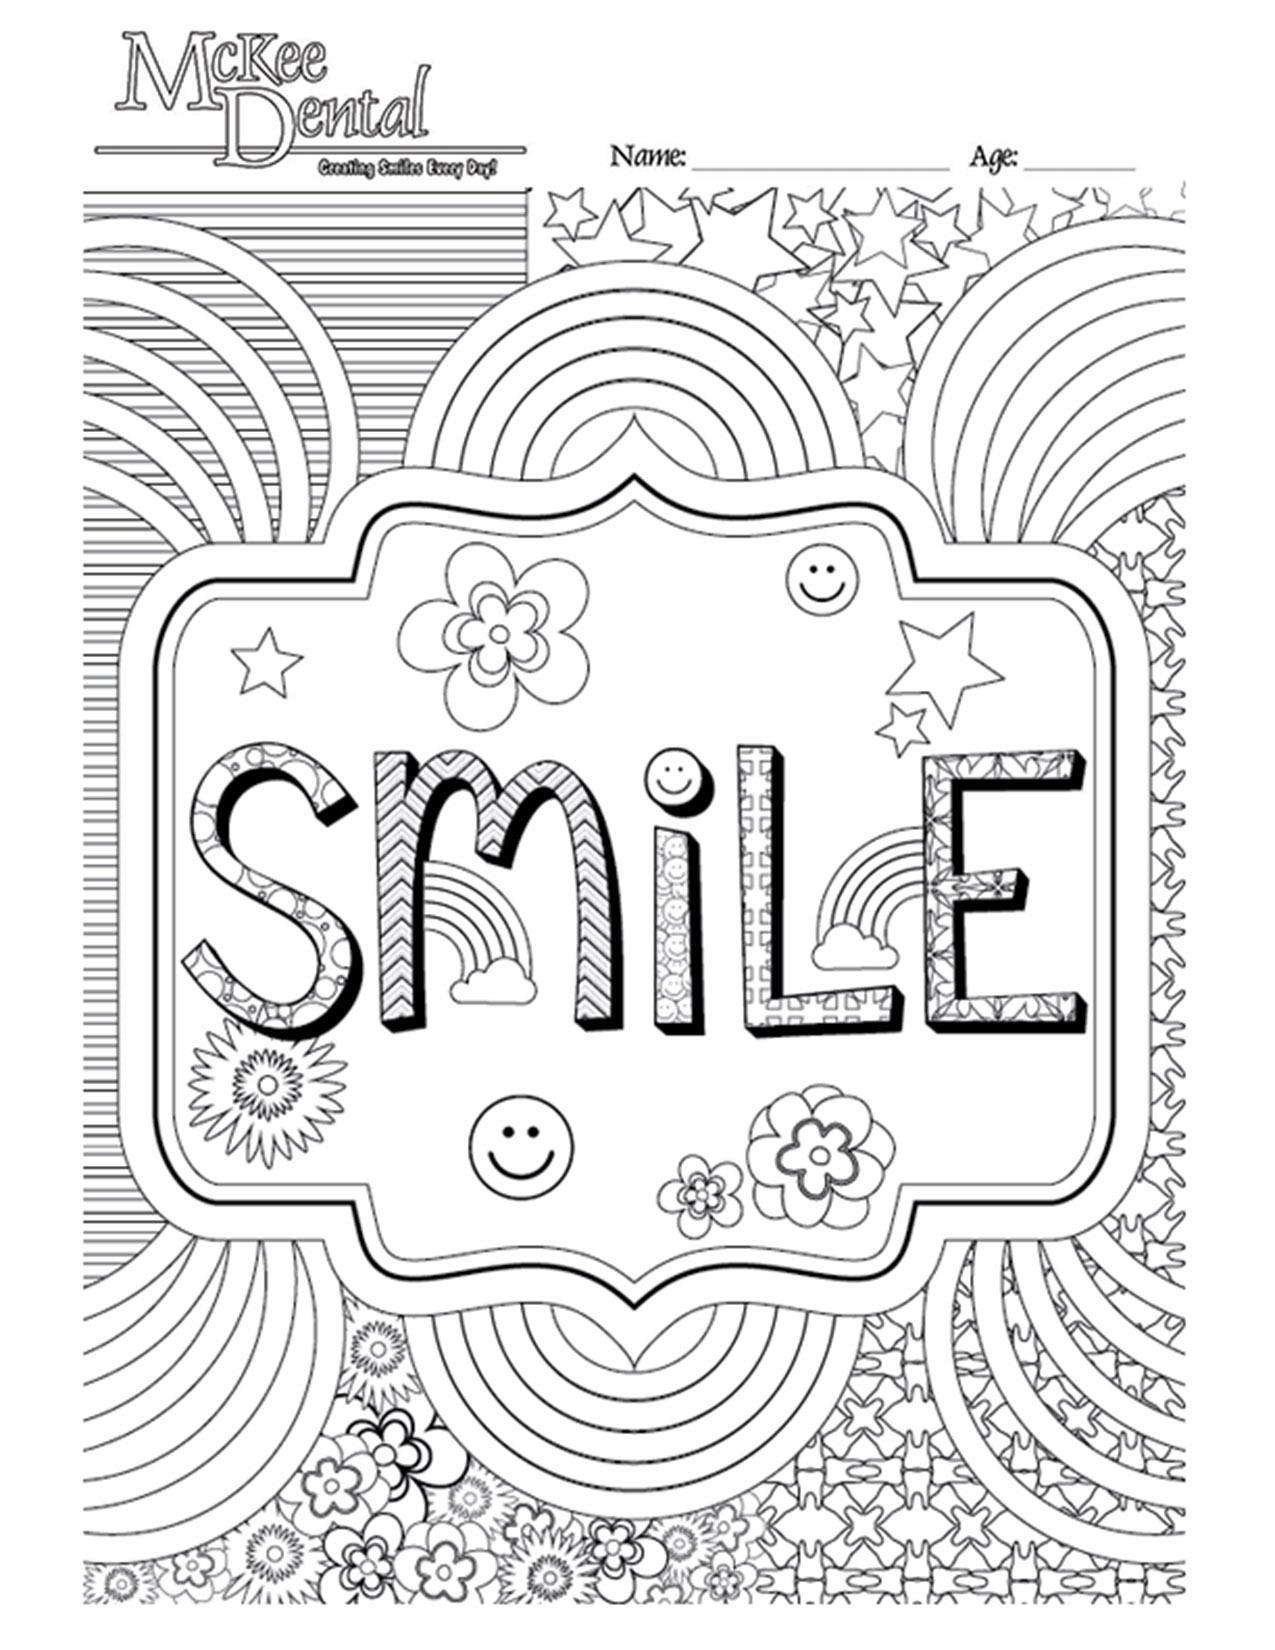 13 17 Smile